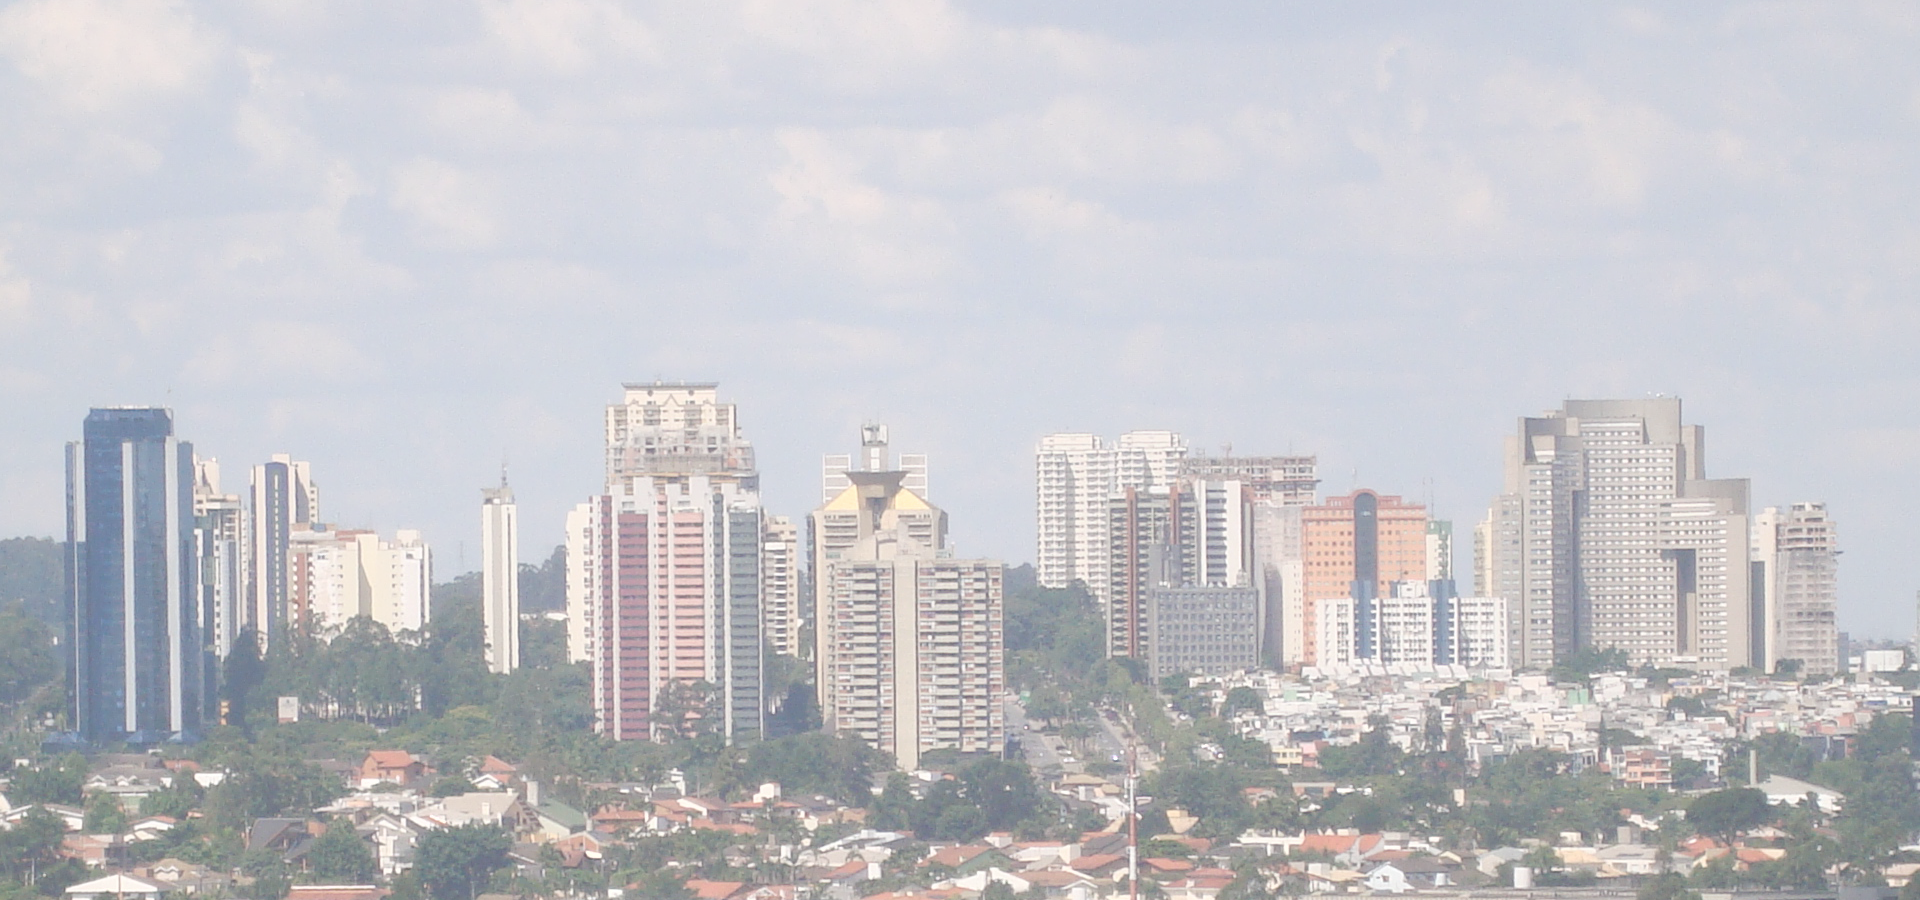 Peer-to-peer advisory in Barueri, São Paulo, Brazil